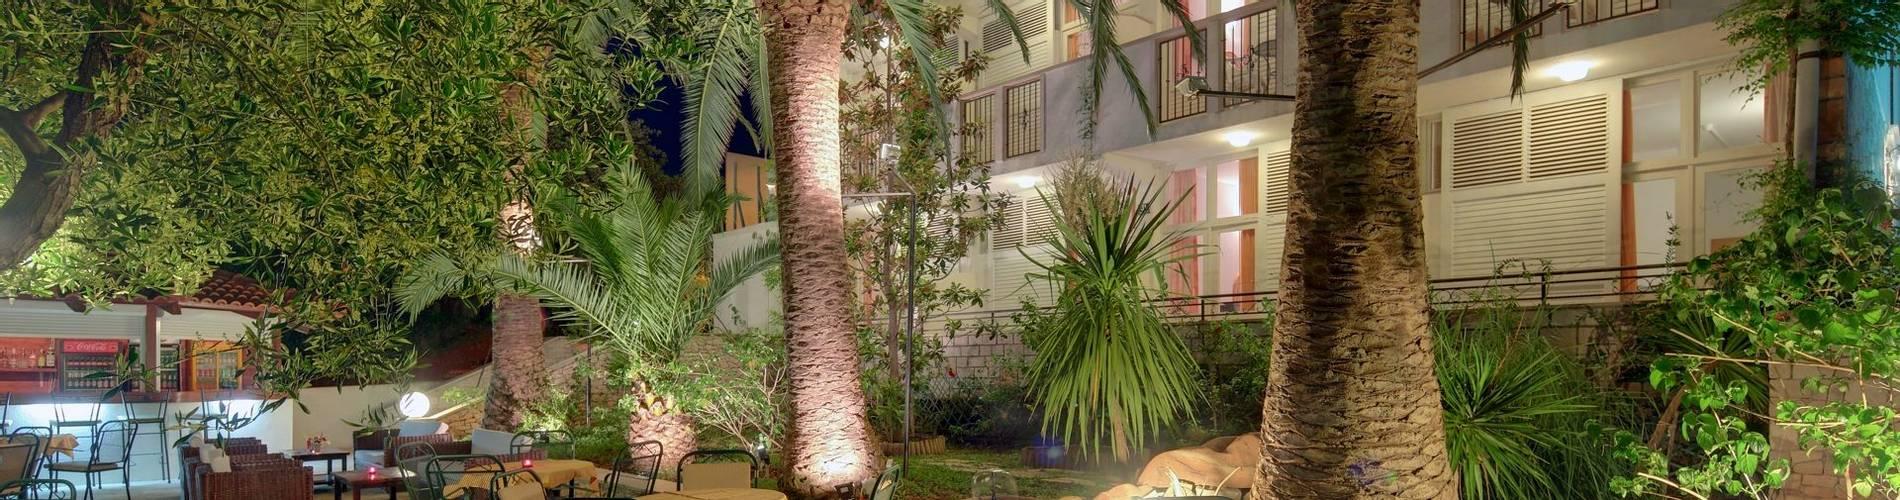 Hotel Villa ADRIATICA 2014 ZFacade Garden 6X4 night 21MB (2).jpg